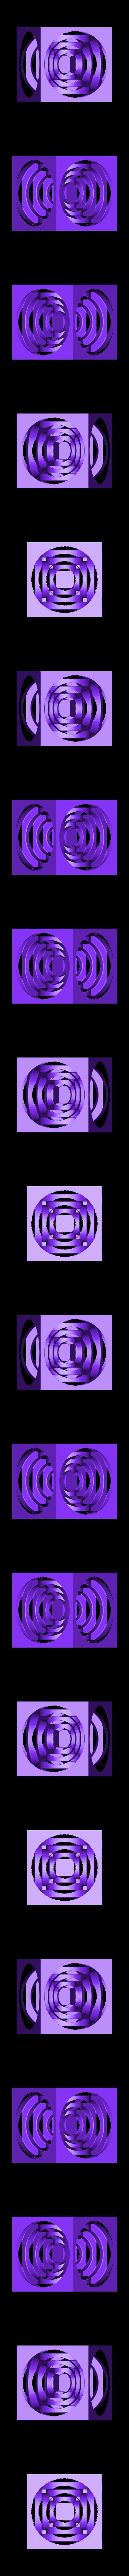 Wrfel_in_Wrfel.stl Download free STL file mathart • 3D printable template, Wailroth3D